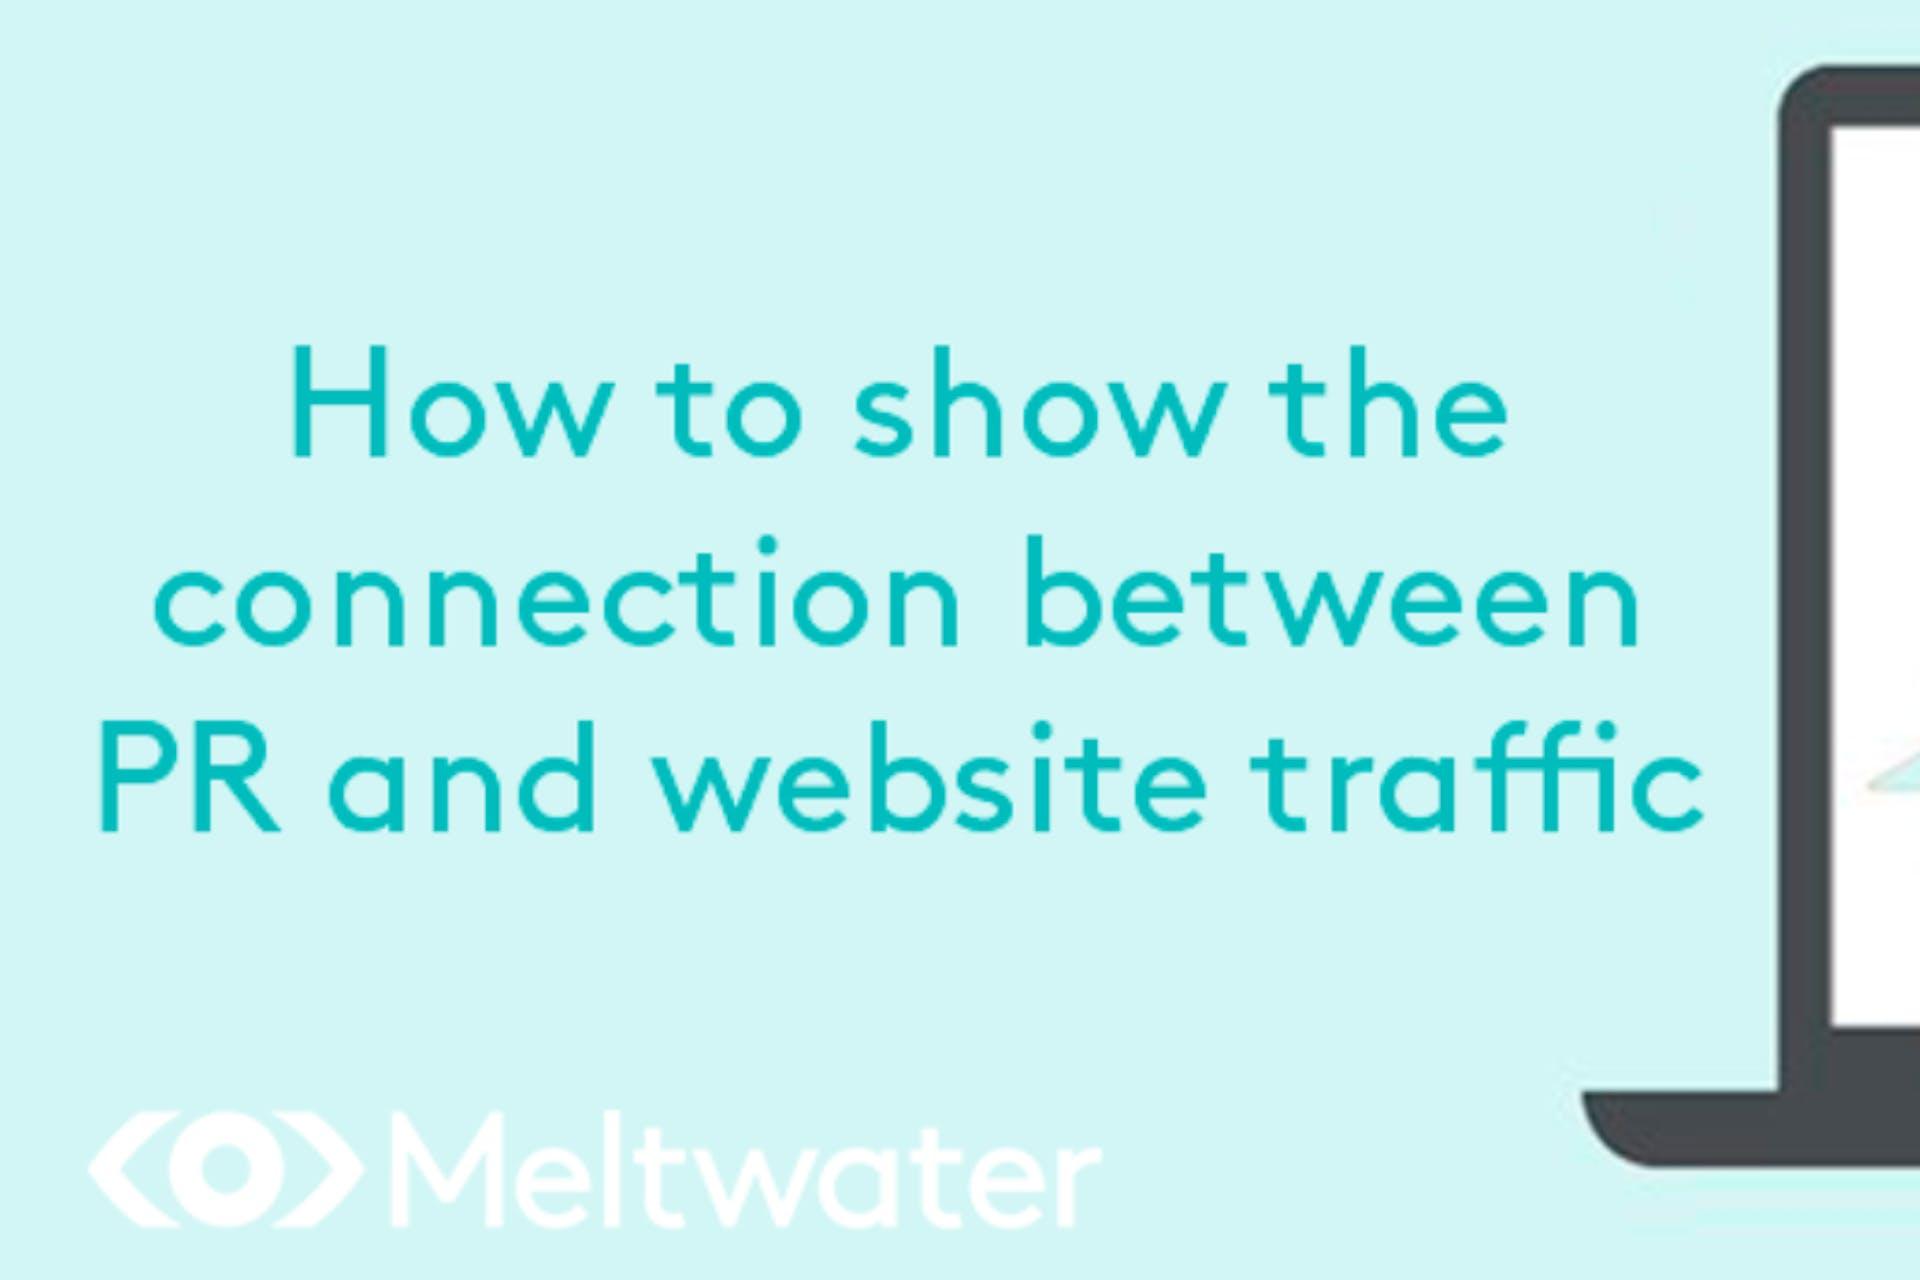 pr and webiste traffic